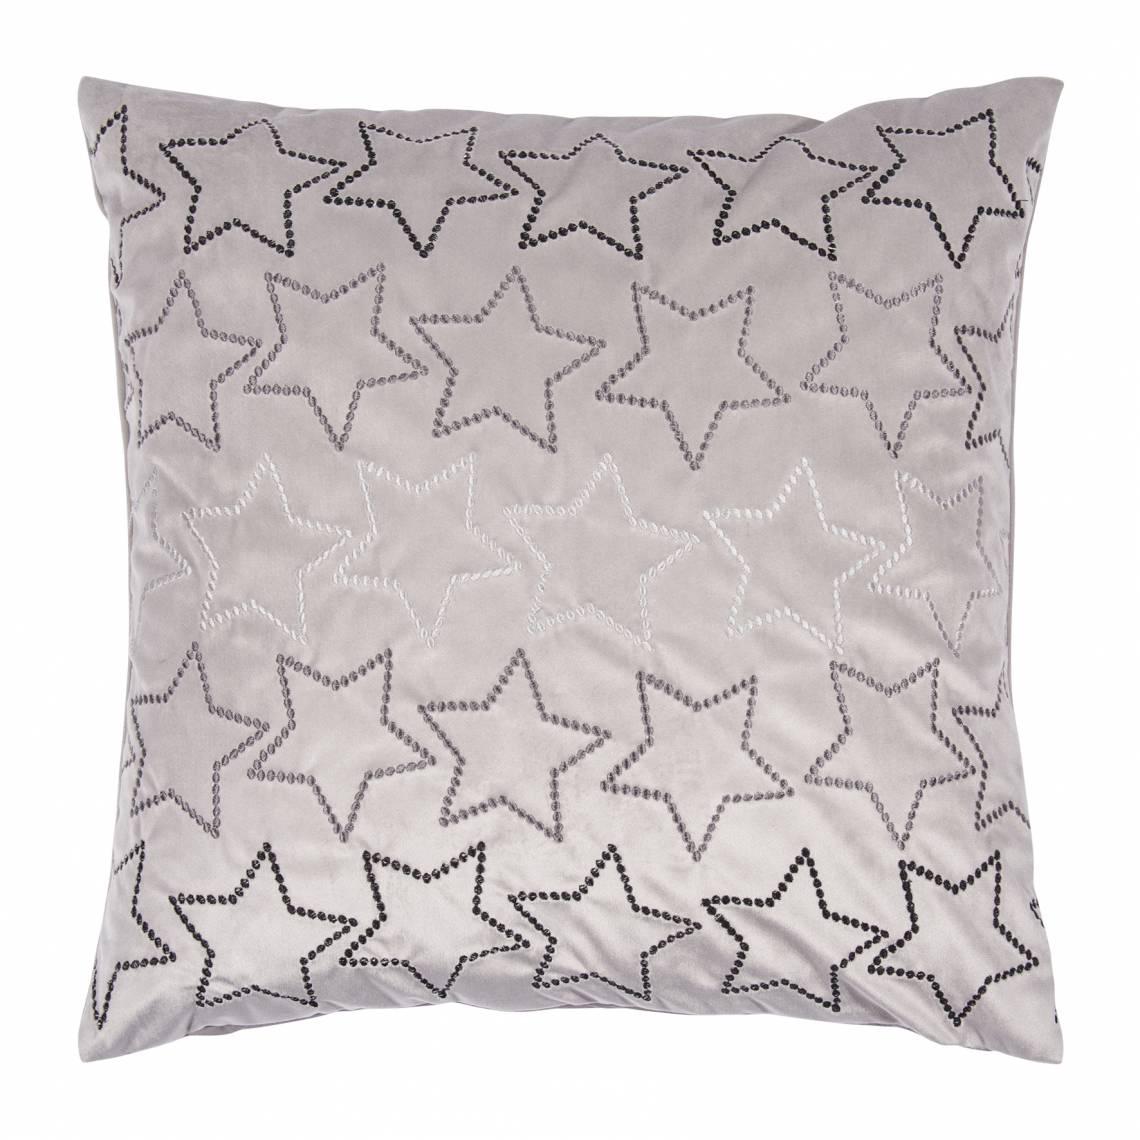 Zodiac Kissenhülle in light grey von pad